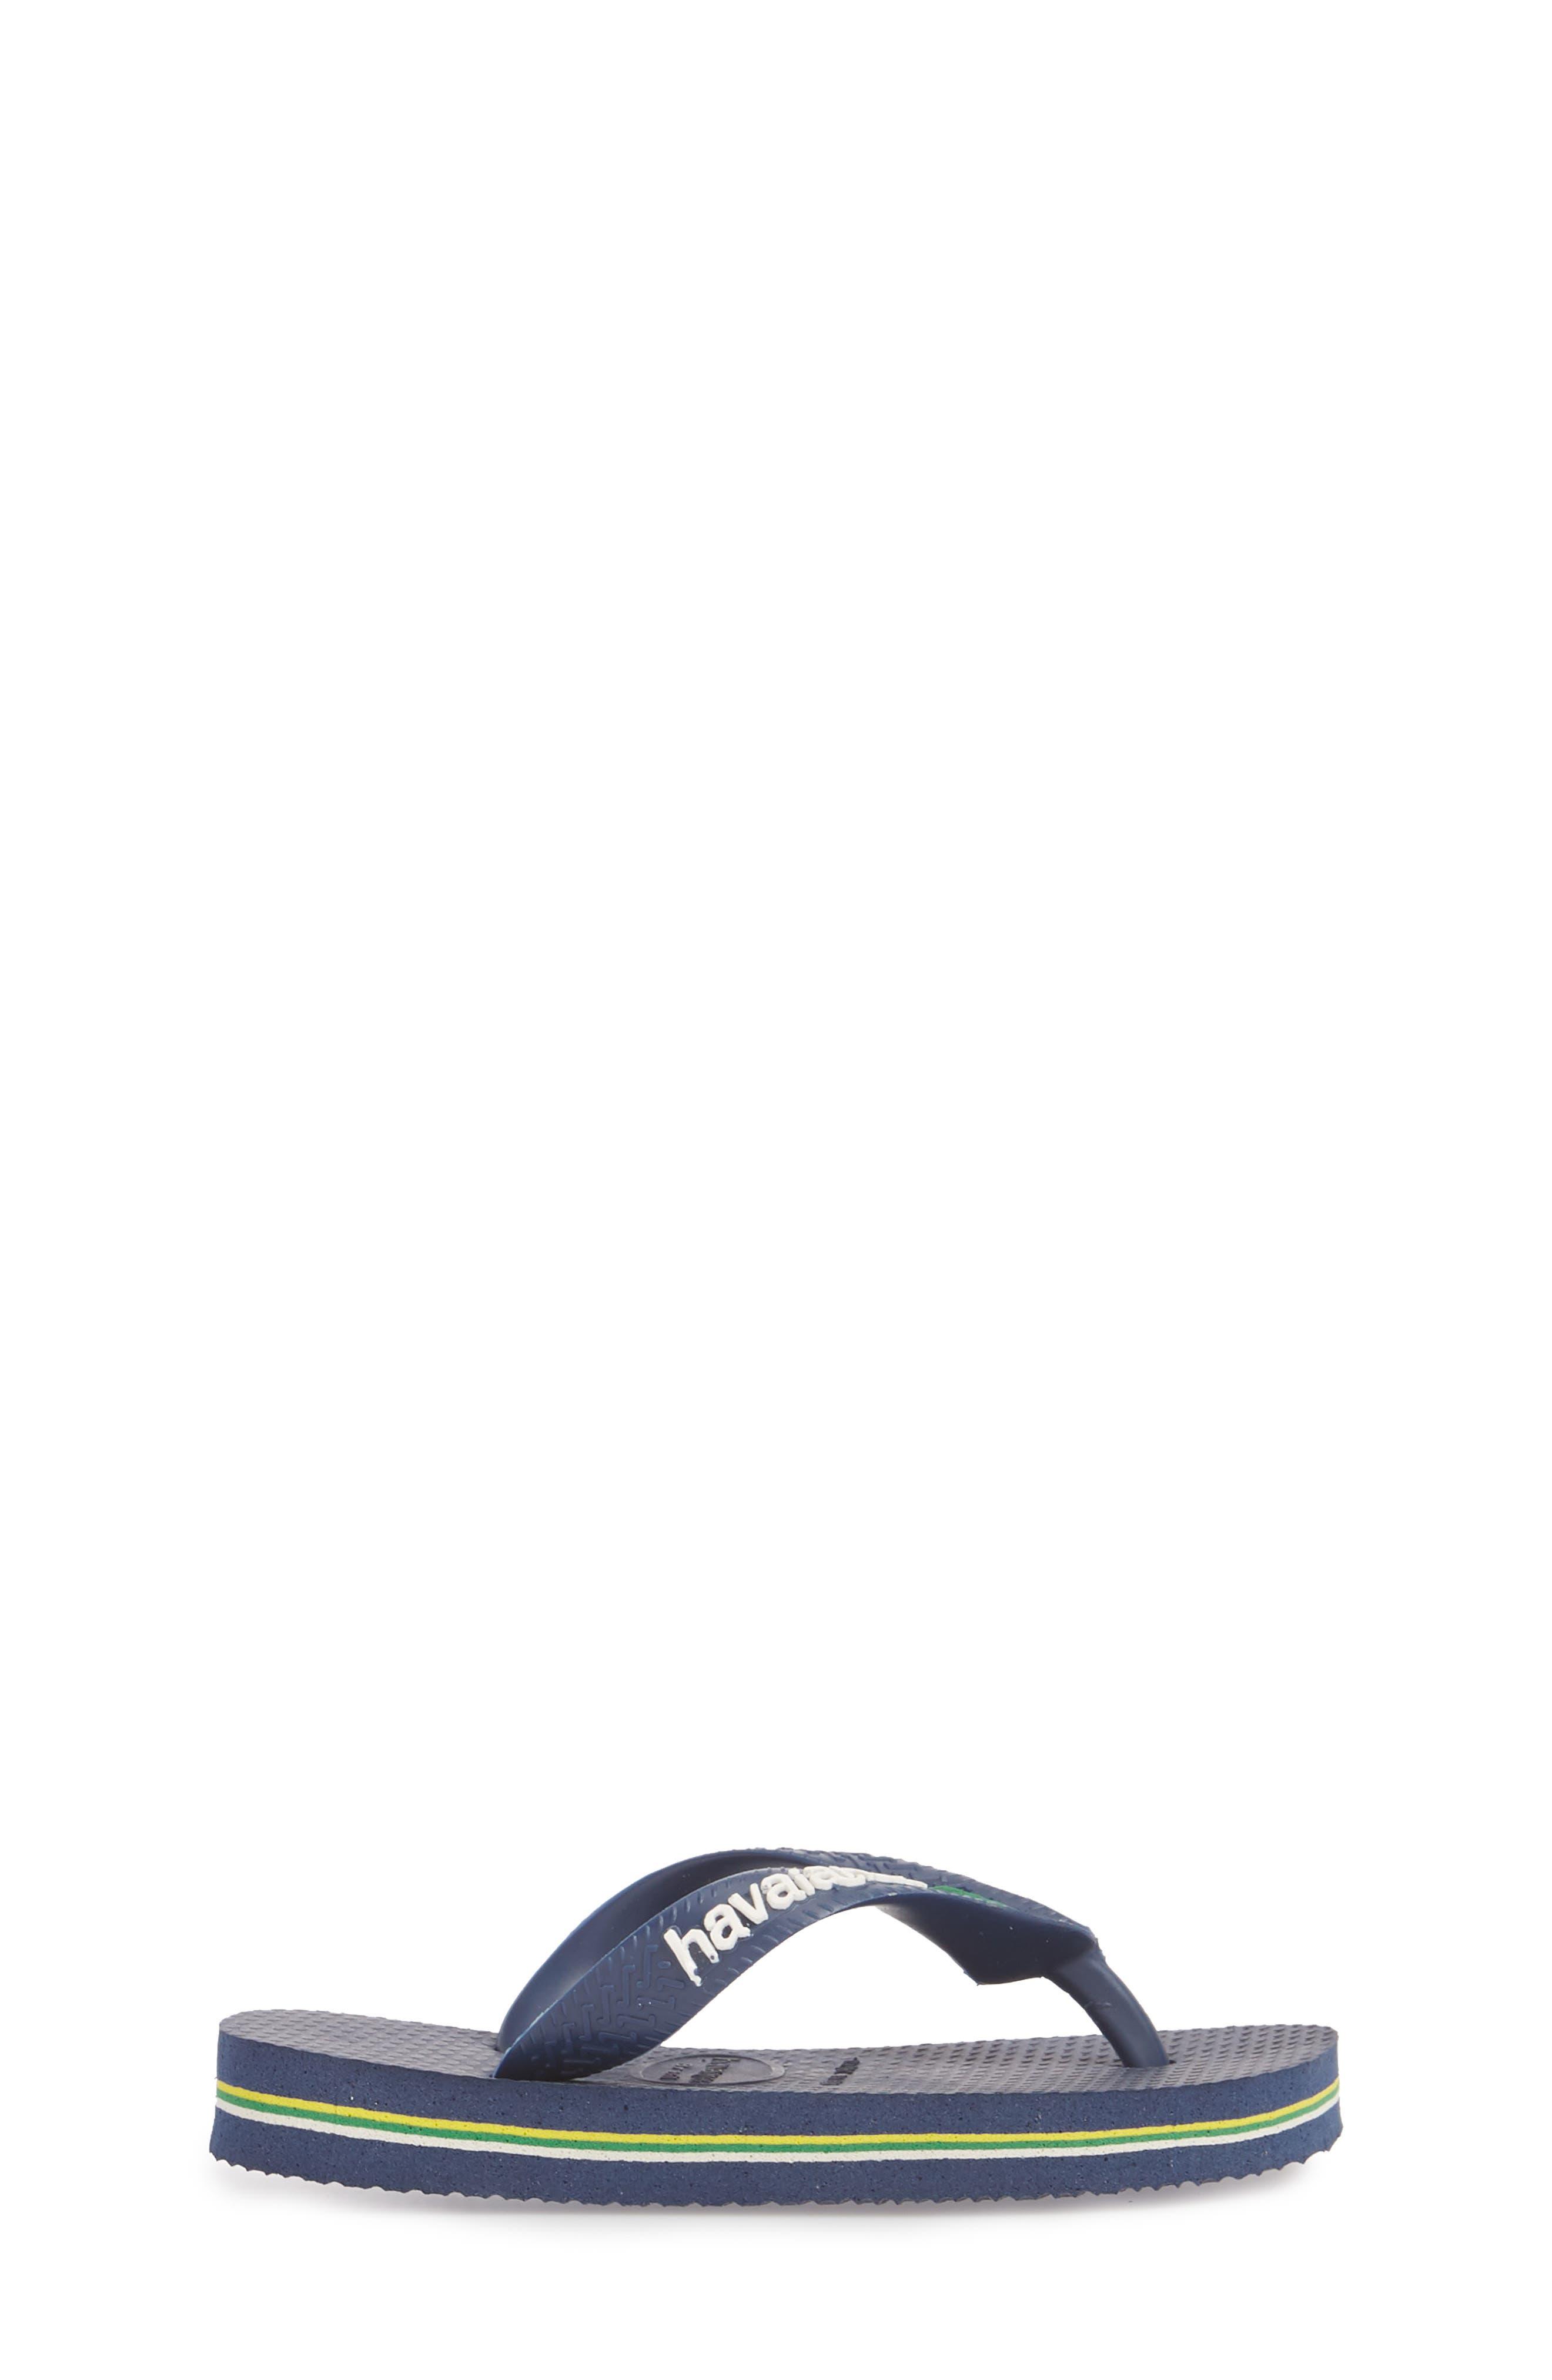 'Brazil Logo' Flip Flop,                             Alternate thumbnail 4, color,                             Navy Blue